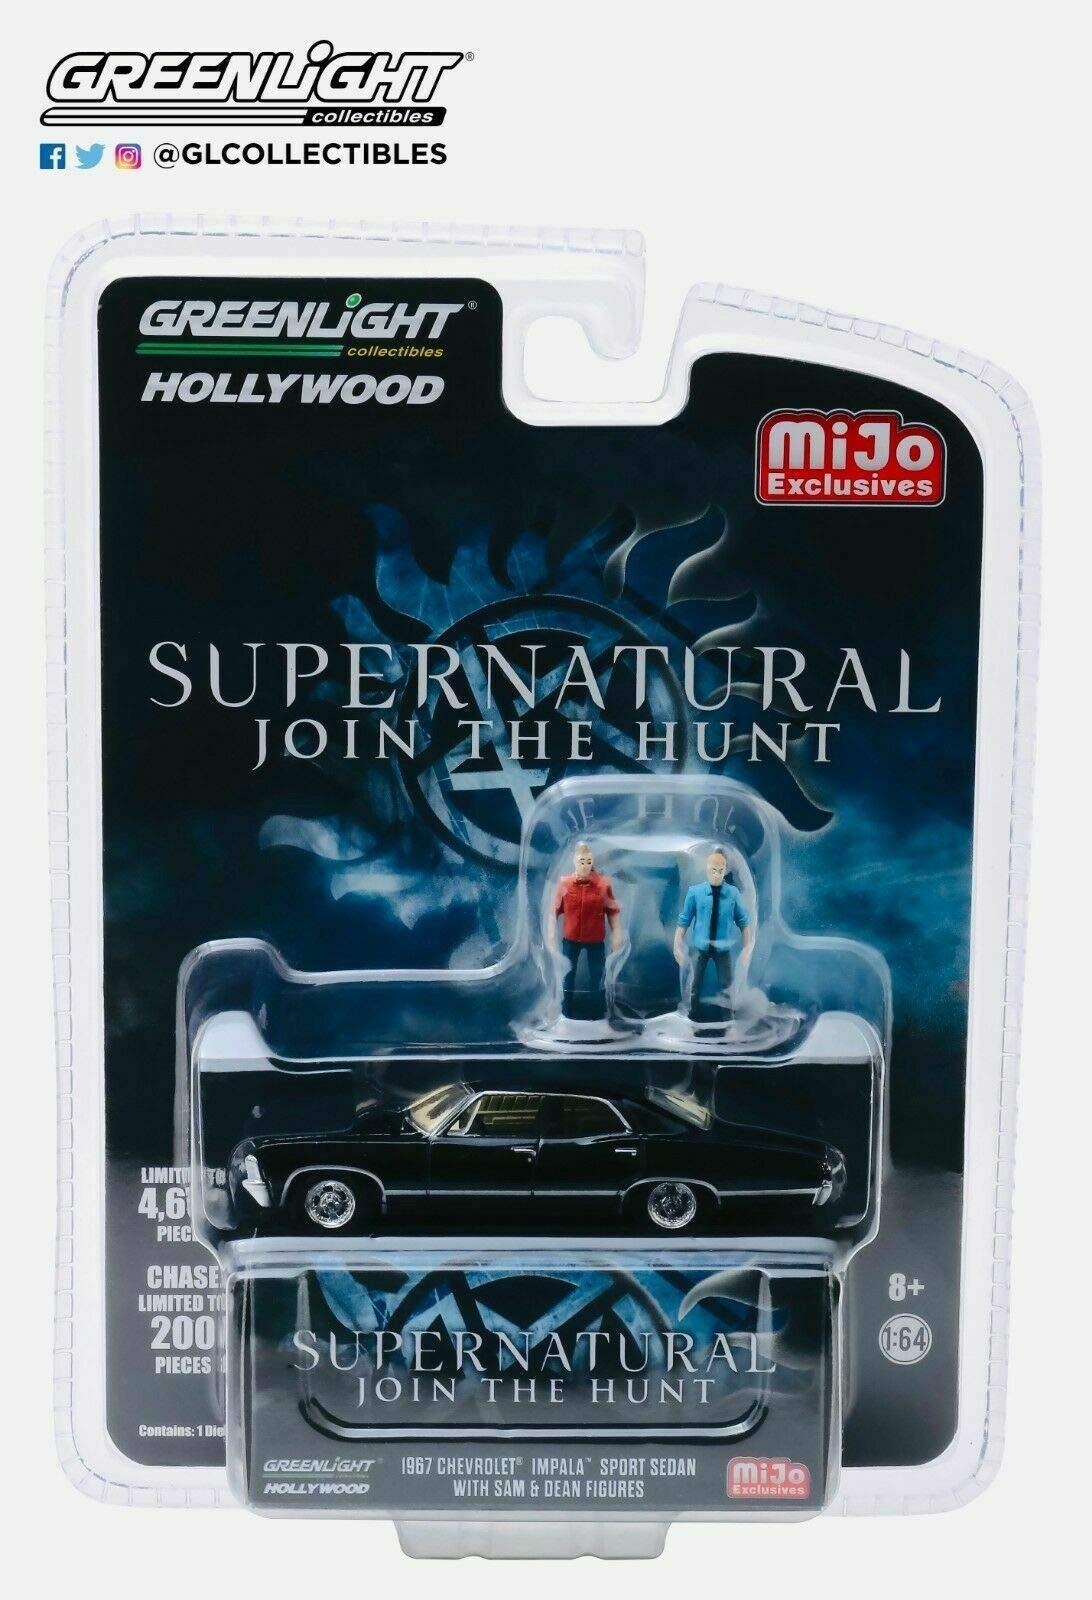 1967 Chevrolet Impala Sport Sedan Black w/Sam and Dean Figurines Supernatural (2005) TV Series Ltd Ed 4,600 pcs 1/64 Diecast Car by Greenlight 51206 by Greenlight